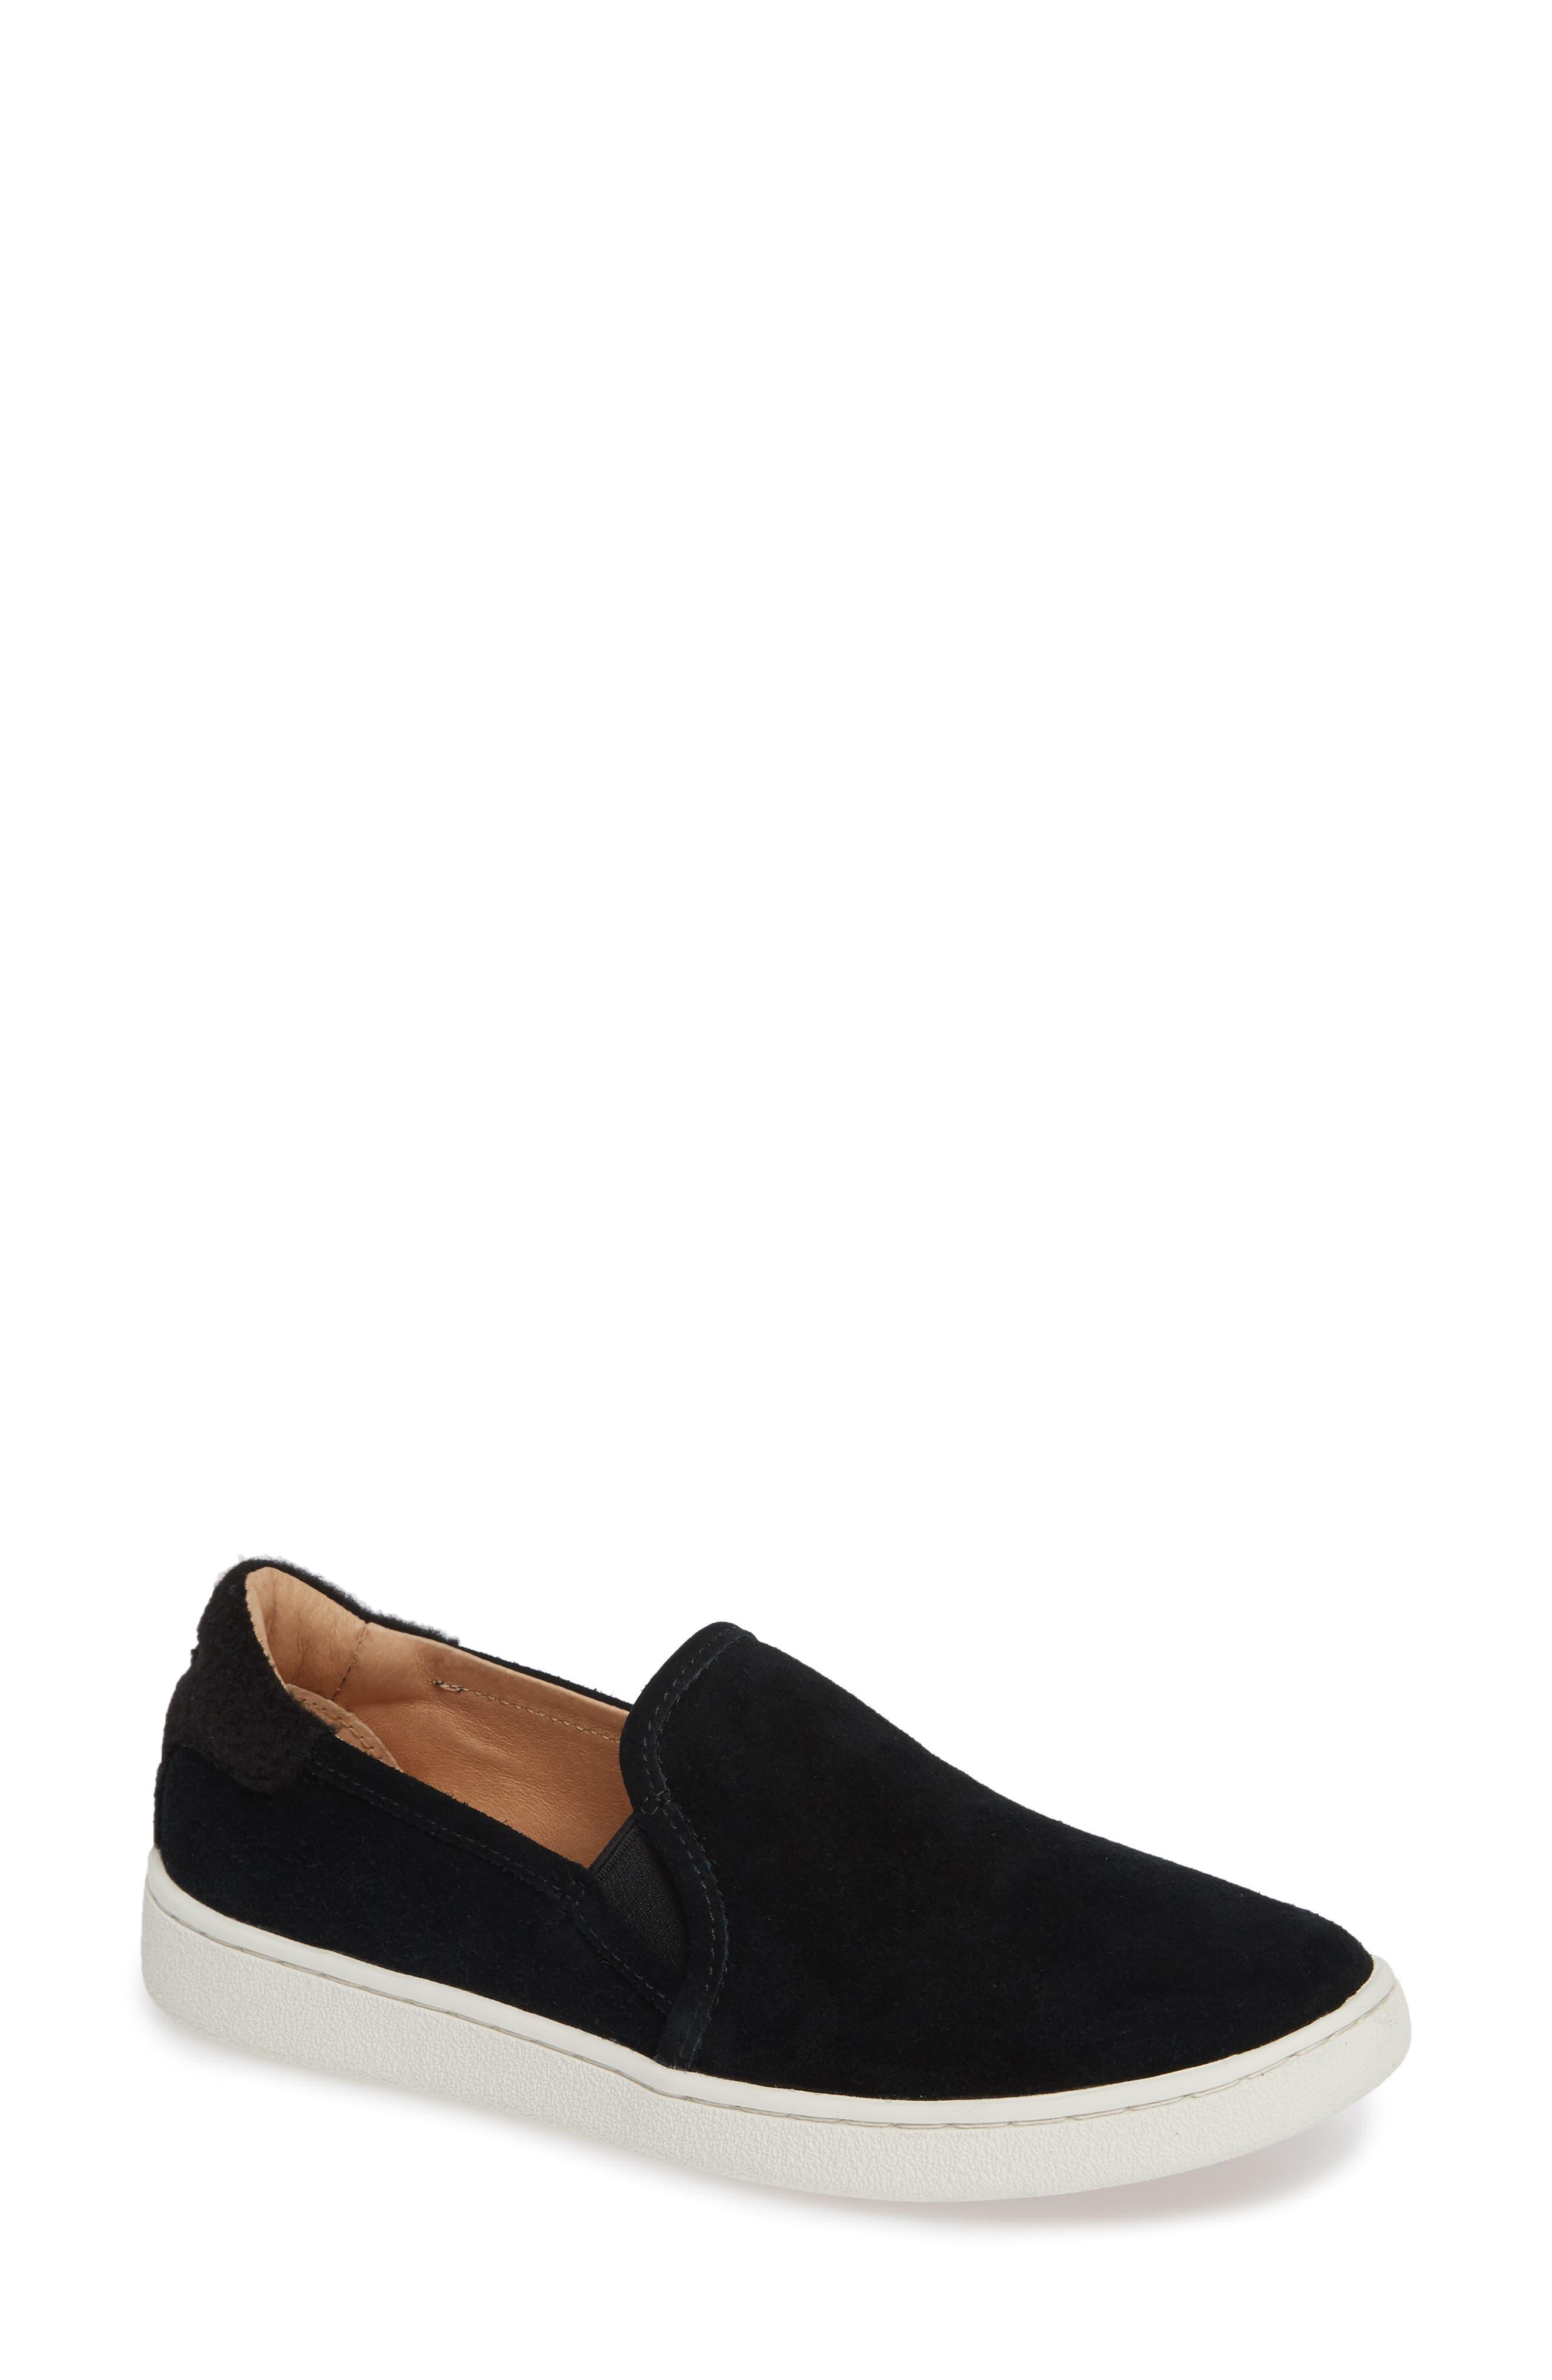 Cas Slip-On Sneaker,                             Main thumbnail 1, color,                             BLACK